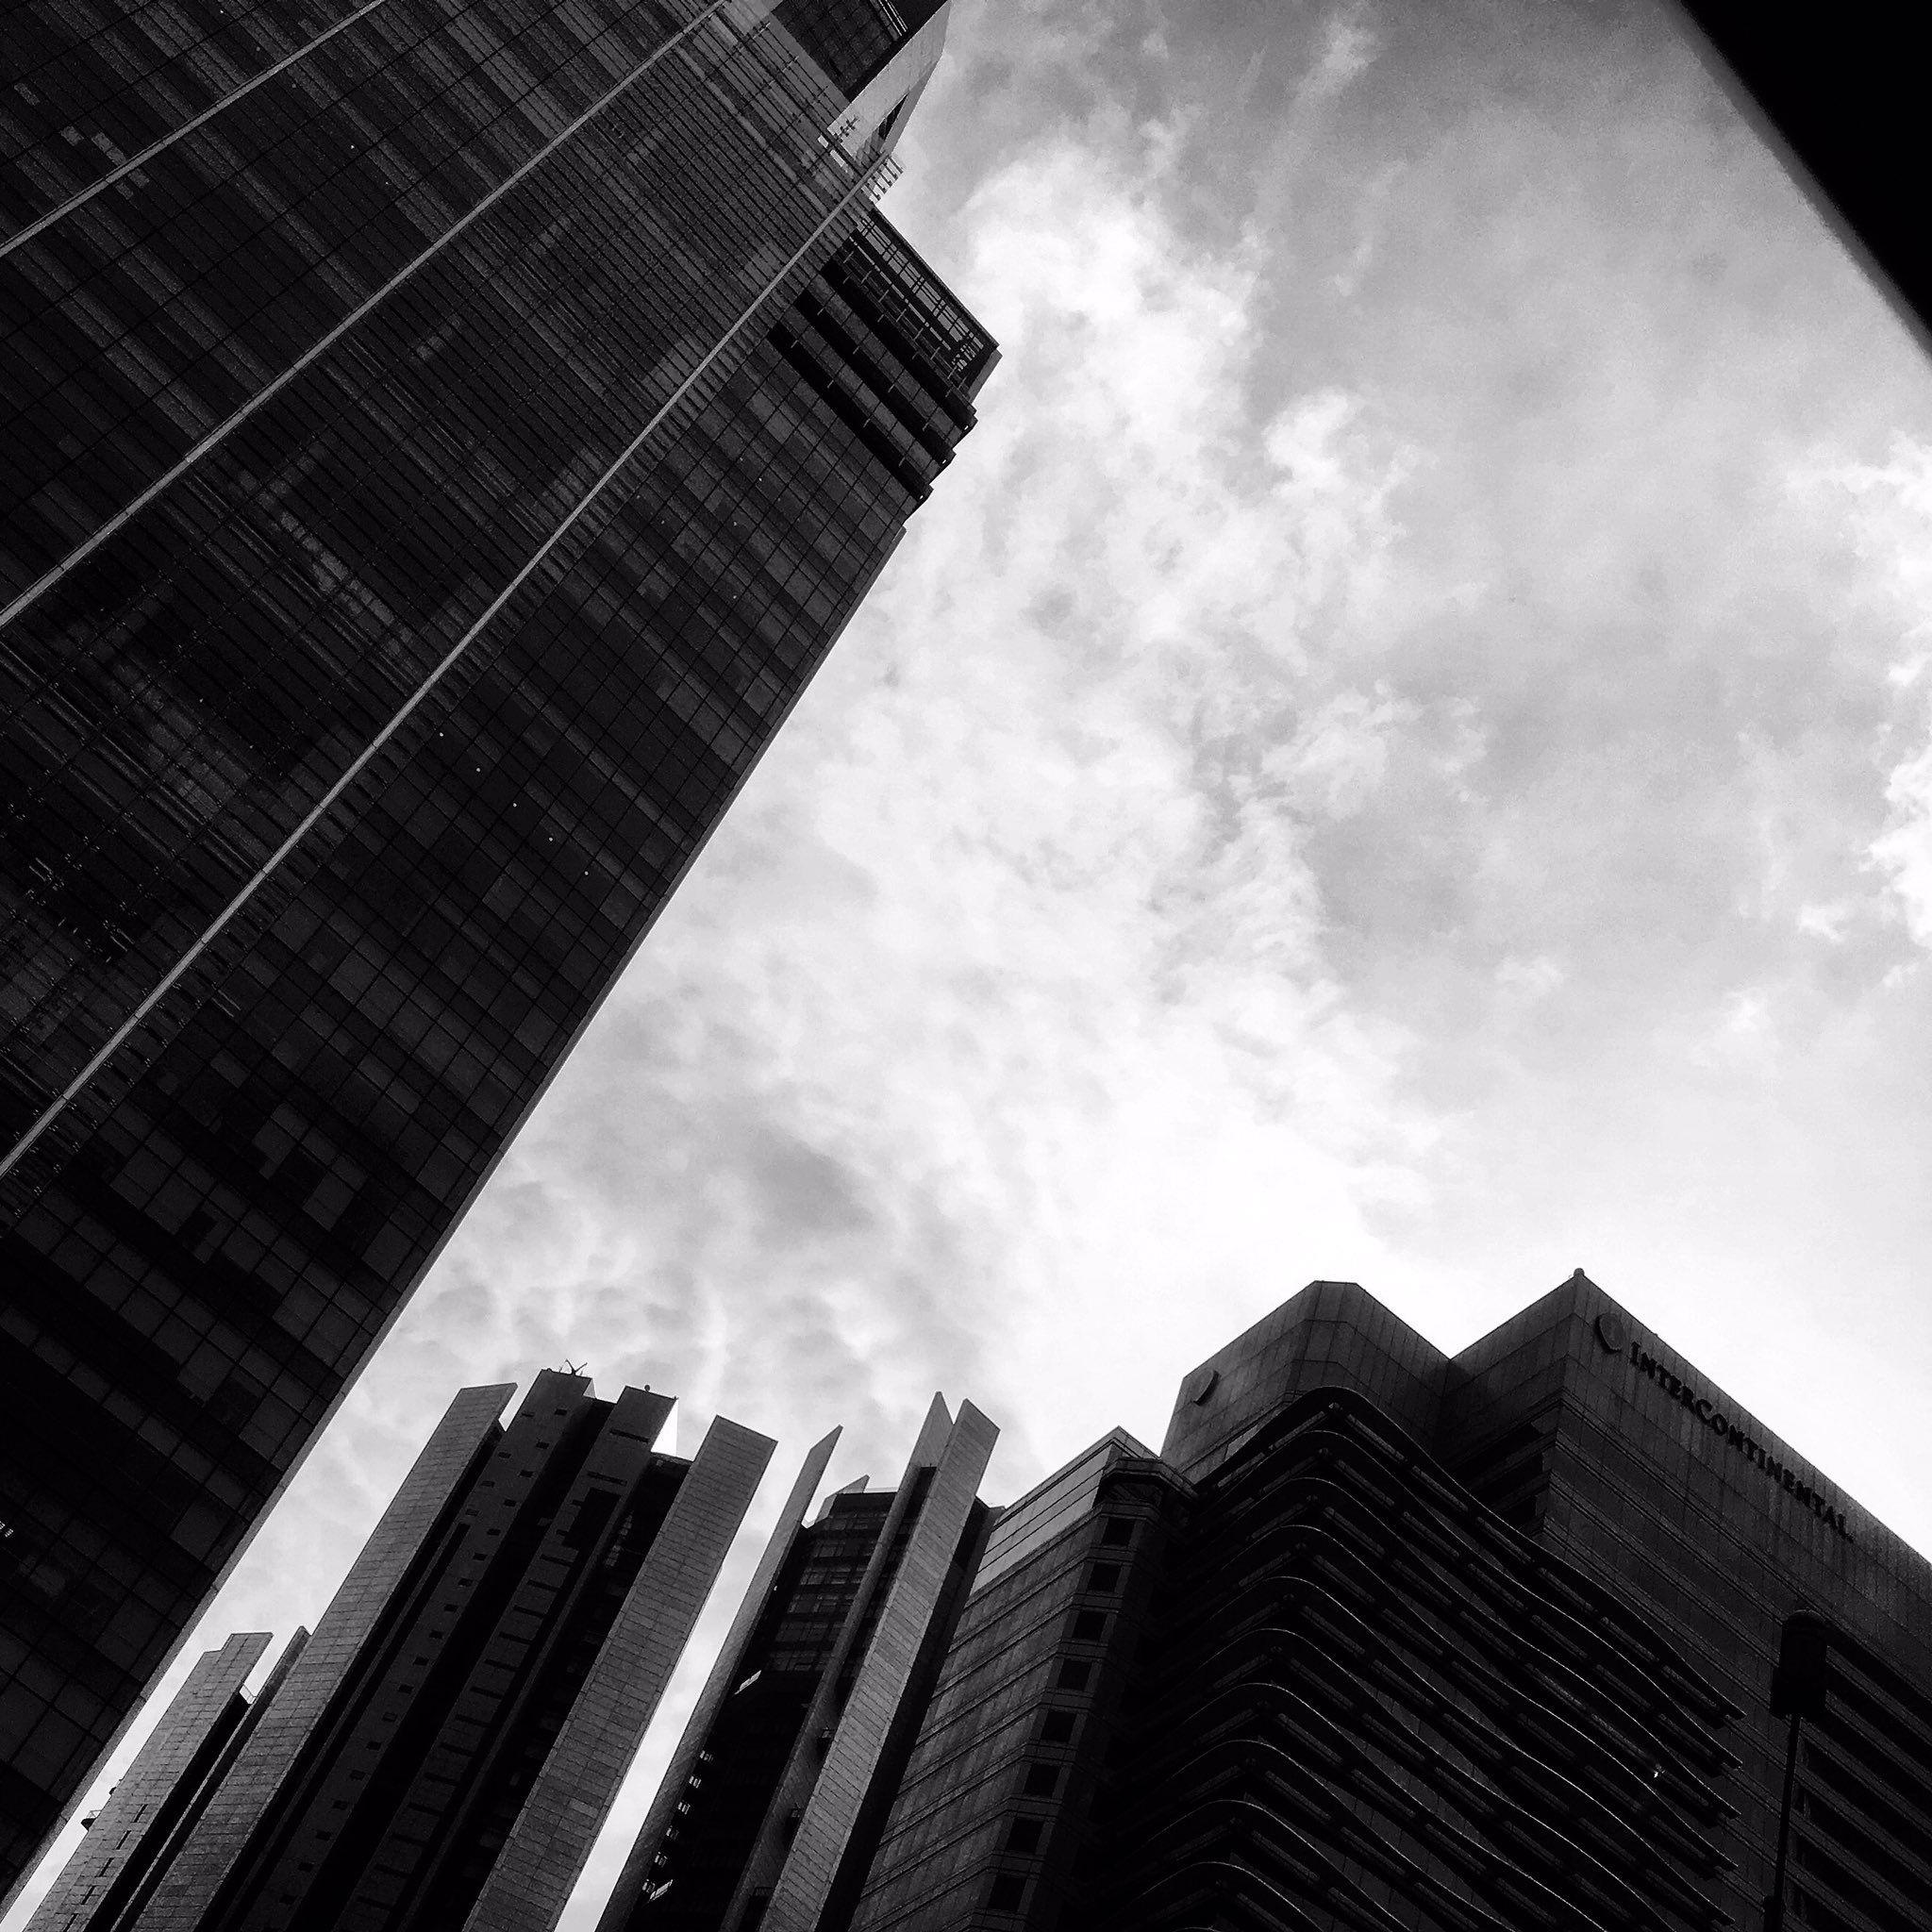 RT: Monochrome skylines #monochrome #photography https://t.co/jZySJddMa1 via EricLeePTH #followme #photography